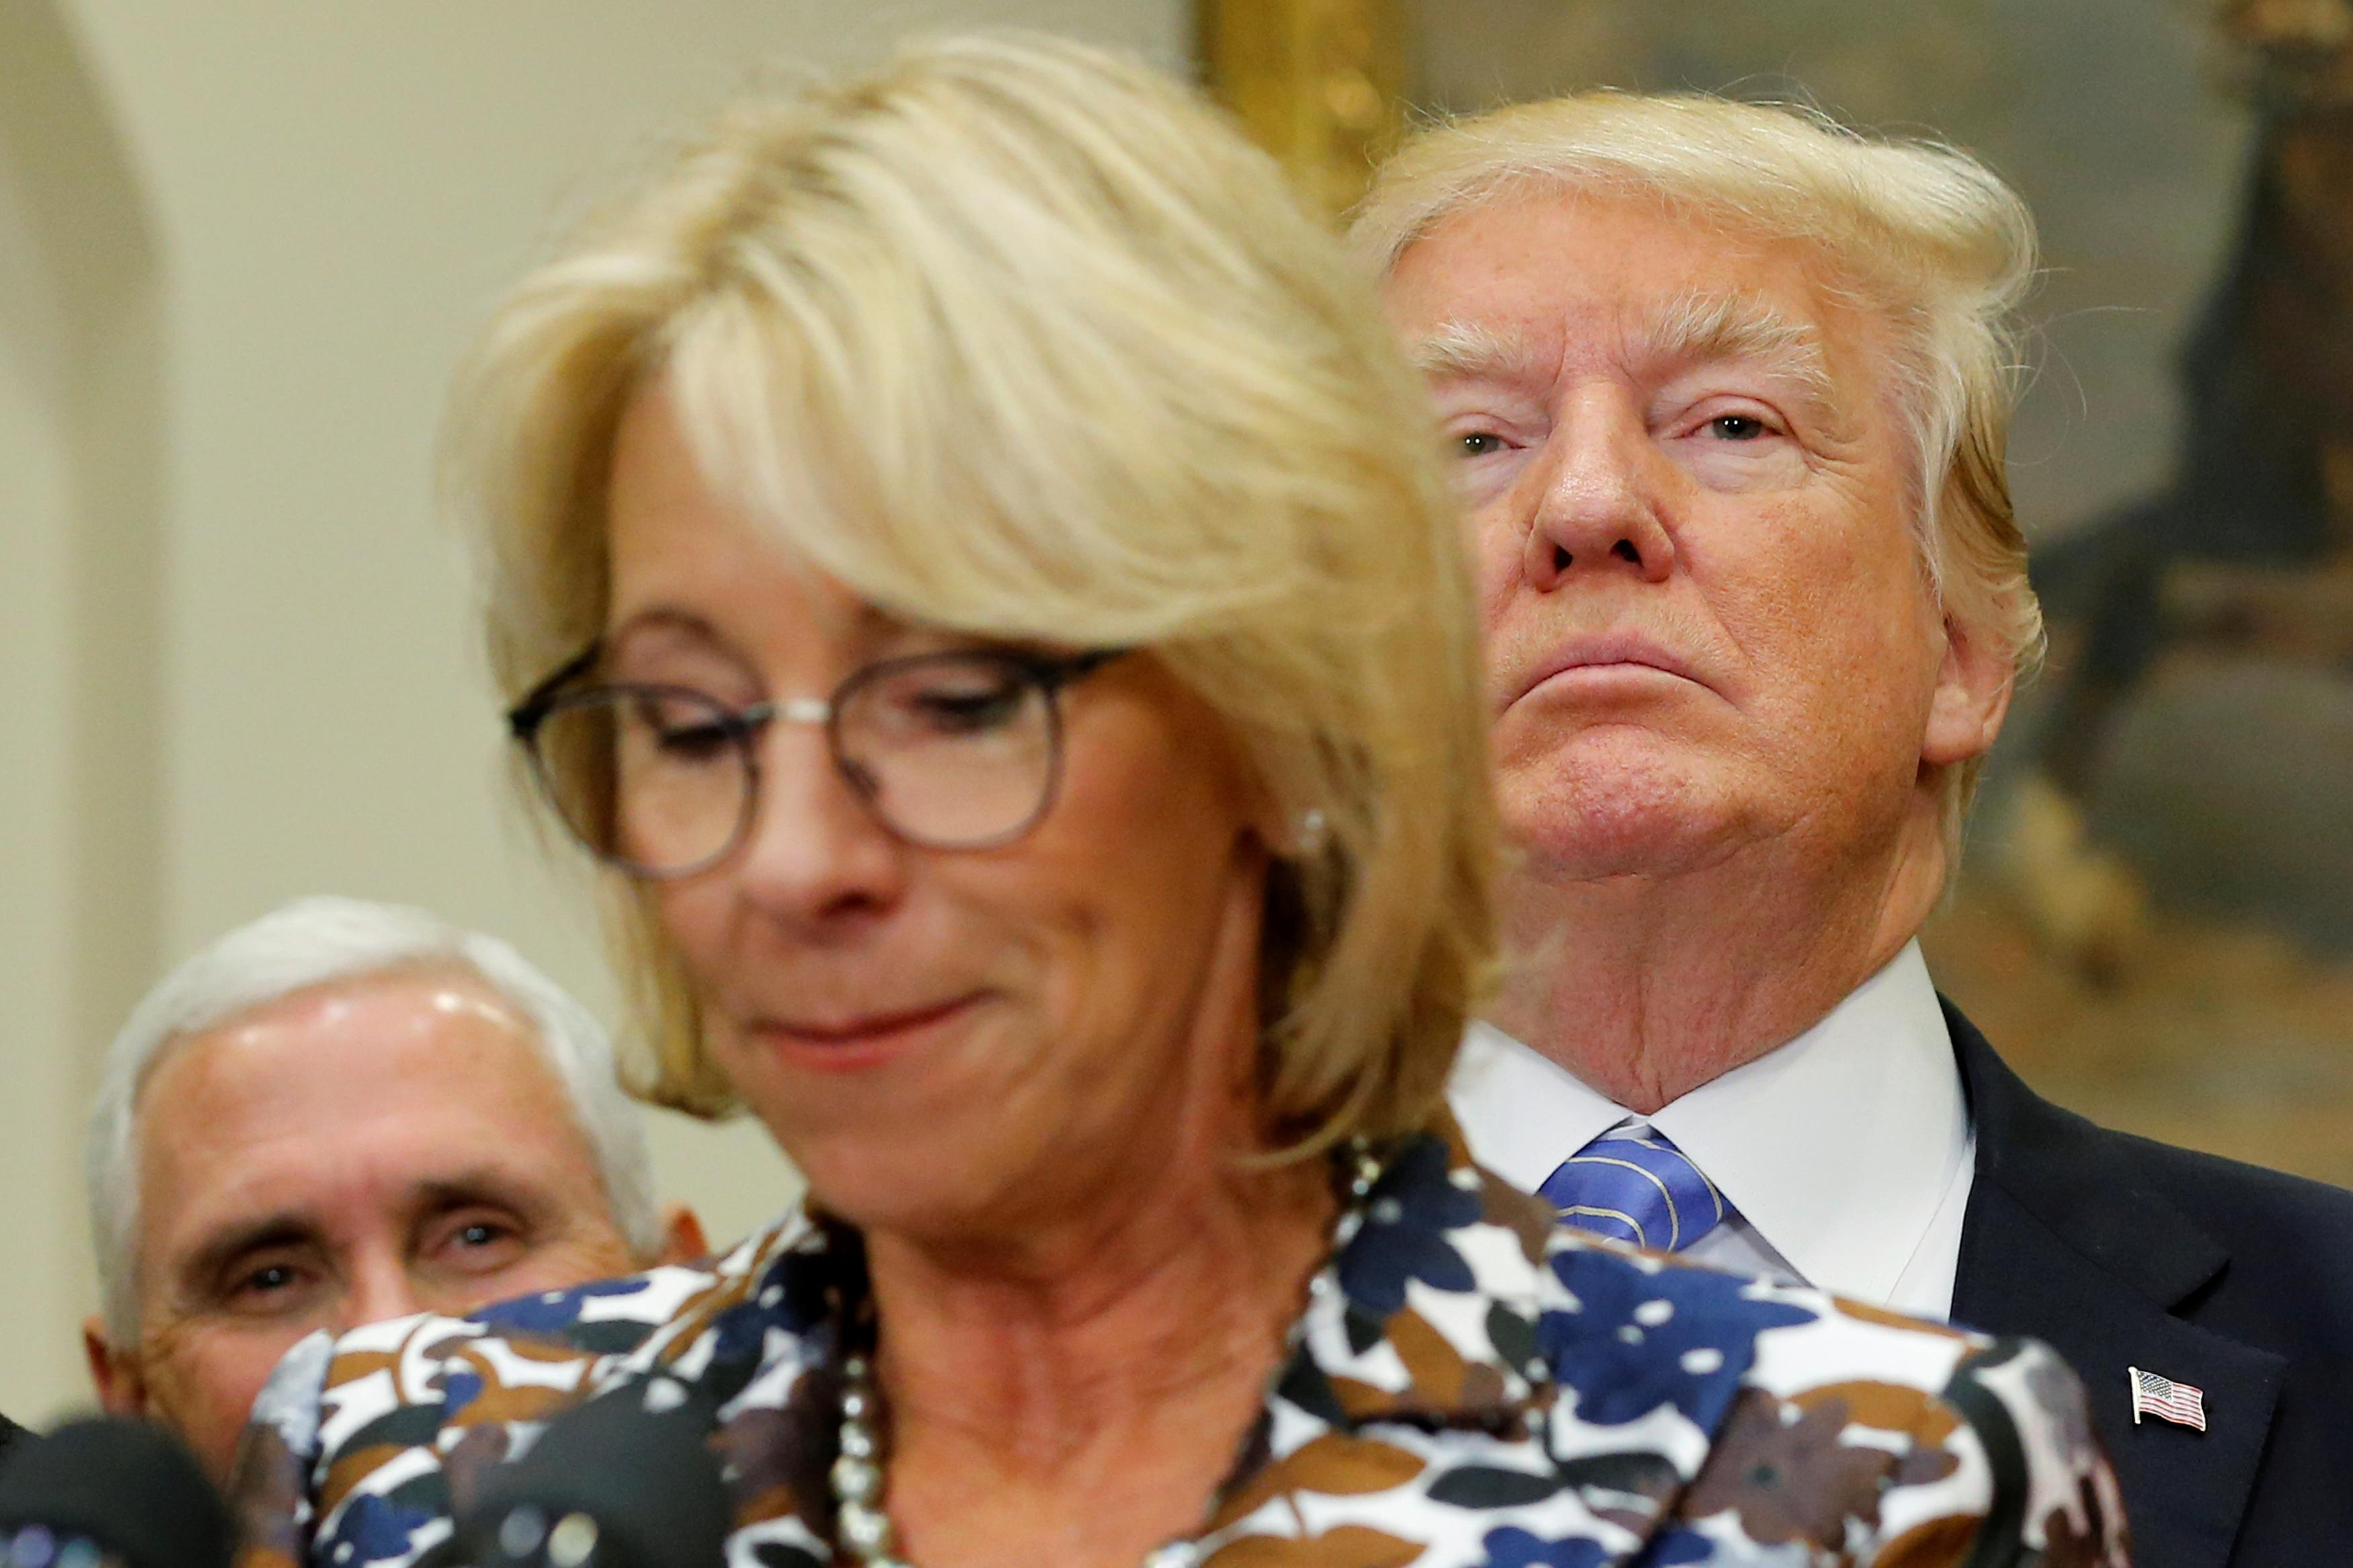 After Trump veto, Education Secretary DeVos sued over Obama-era rule change